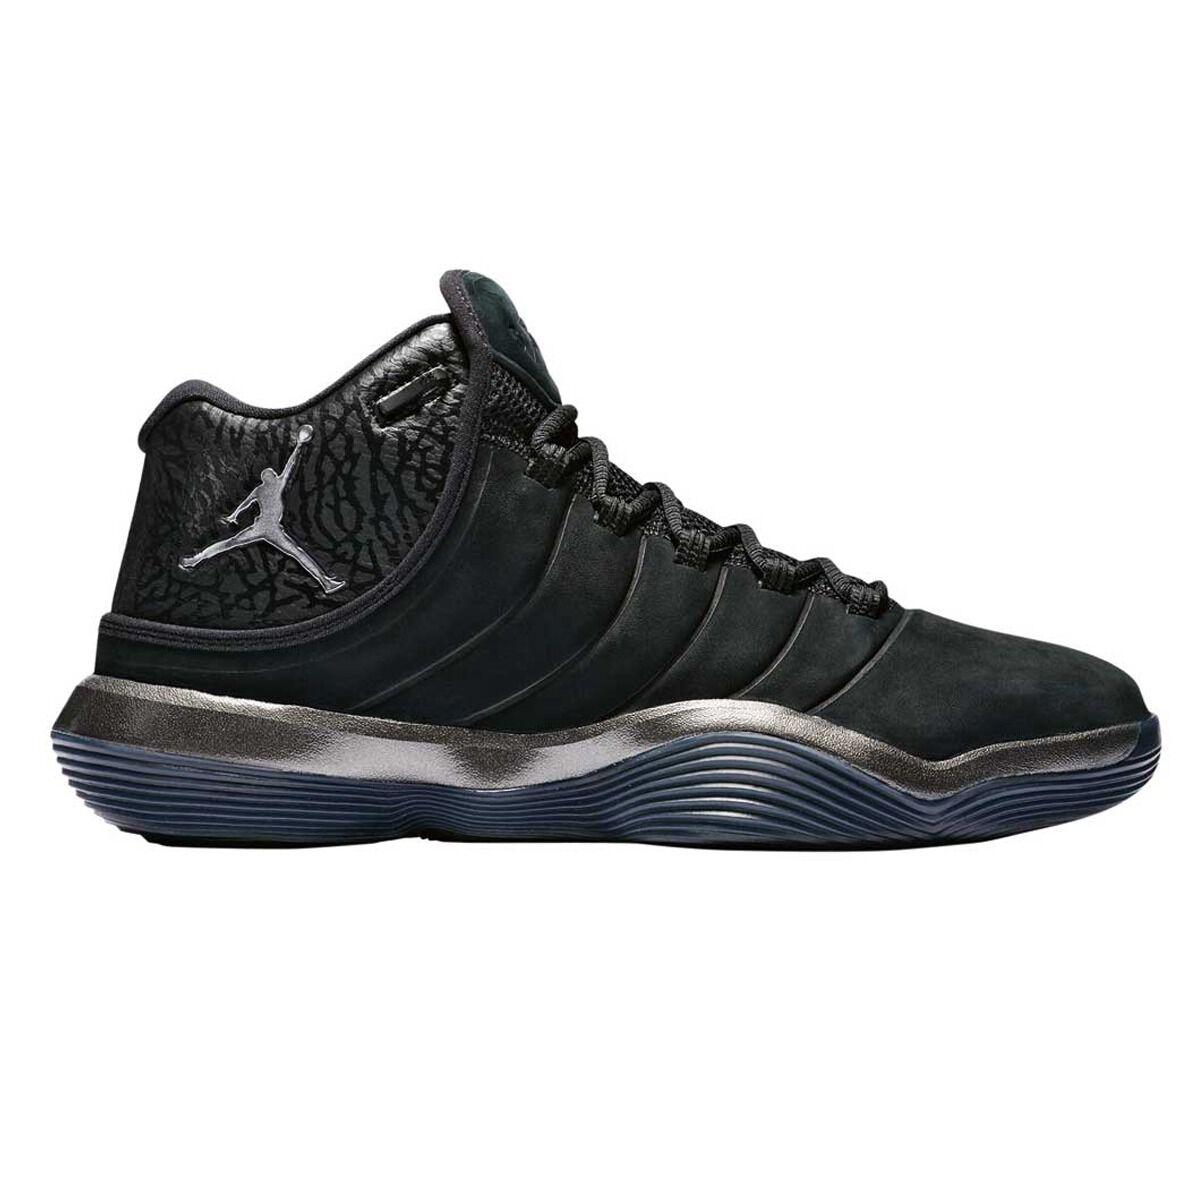 88308d5fb22bc ... sale nike jordan lunar superfly mens basketball shoes black silver us 8  black silver 623ed 5daee